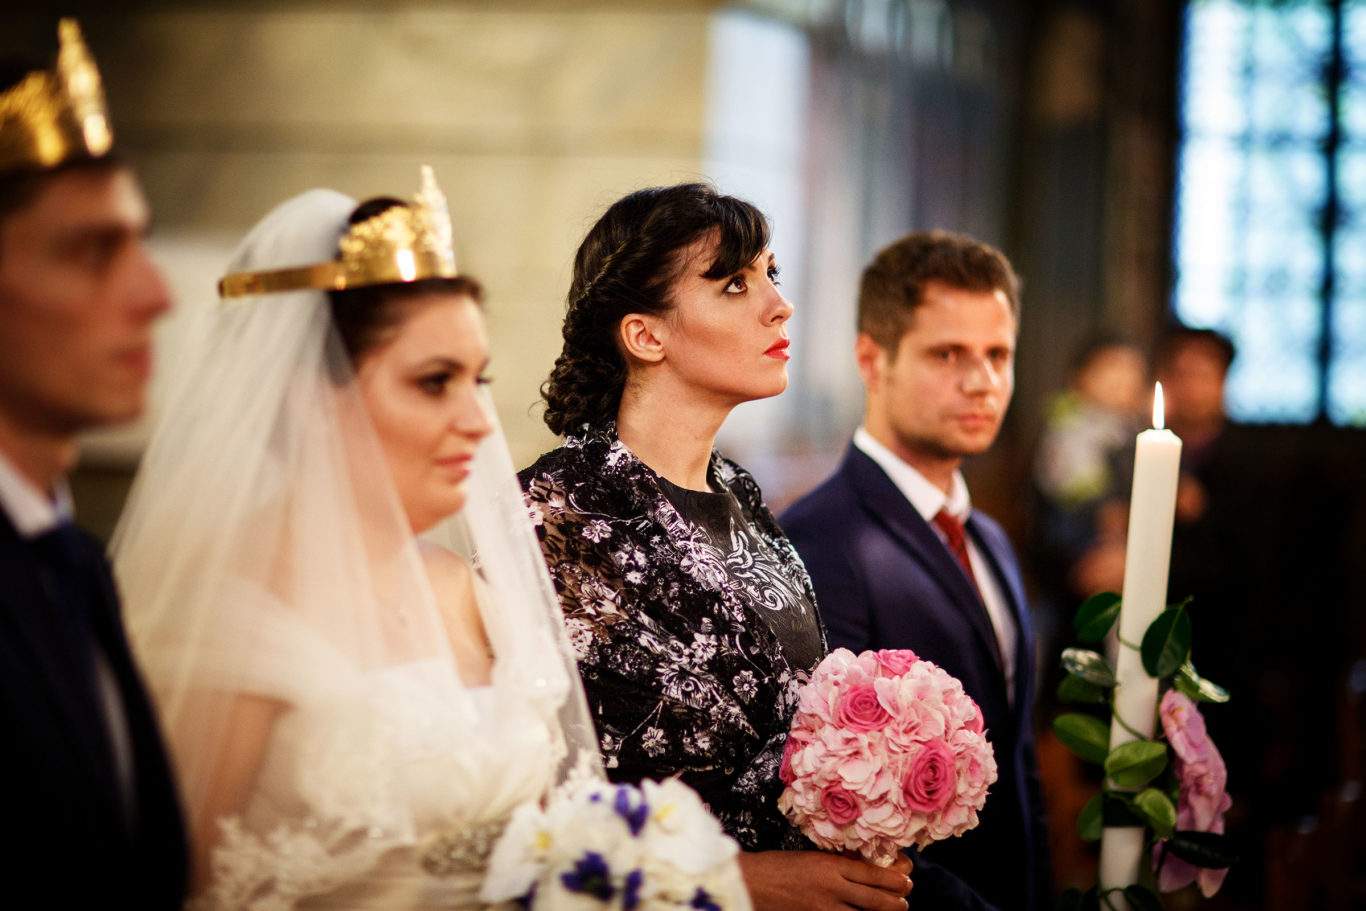 0242-Fotografie-nunta-Roxana-Costin-fotograf-Ciprian-Dumitrescu-DCF_5707